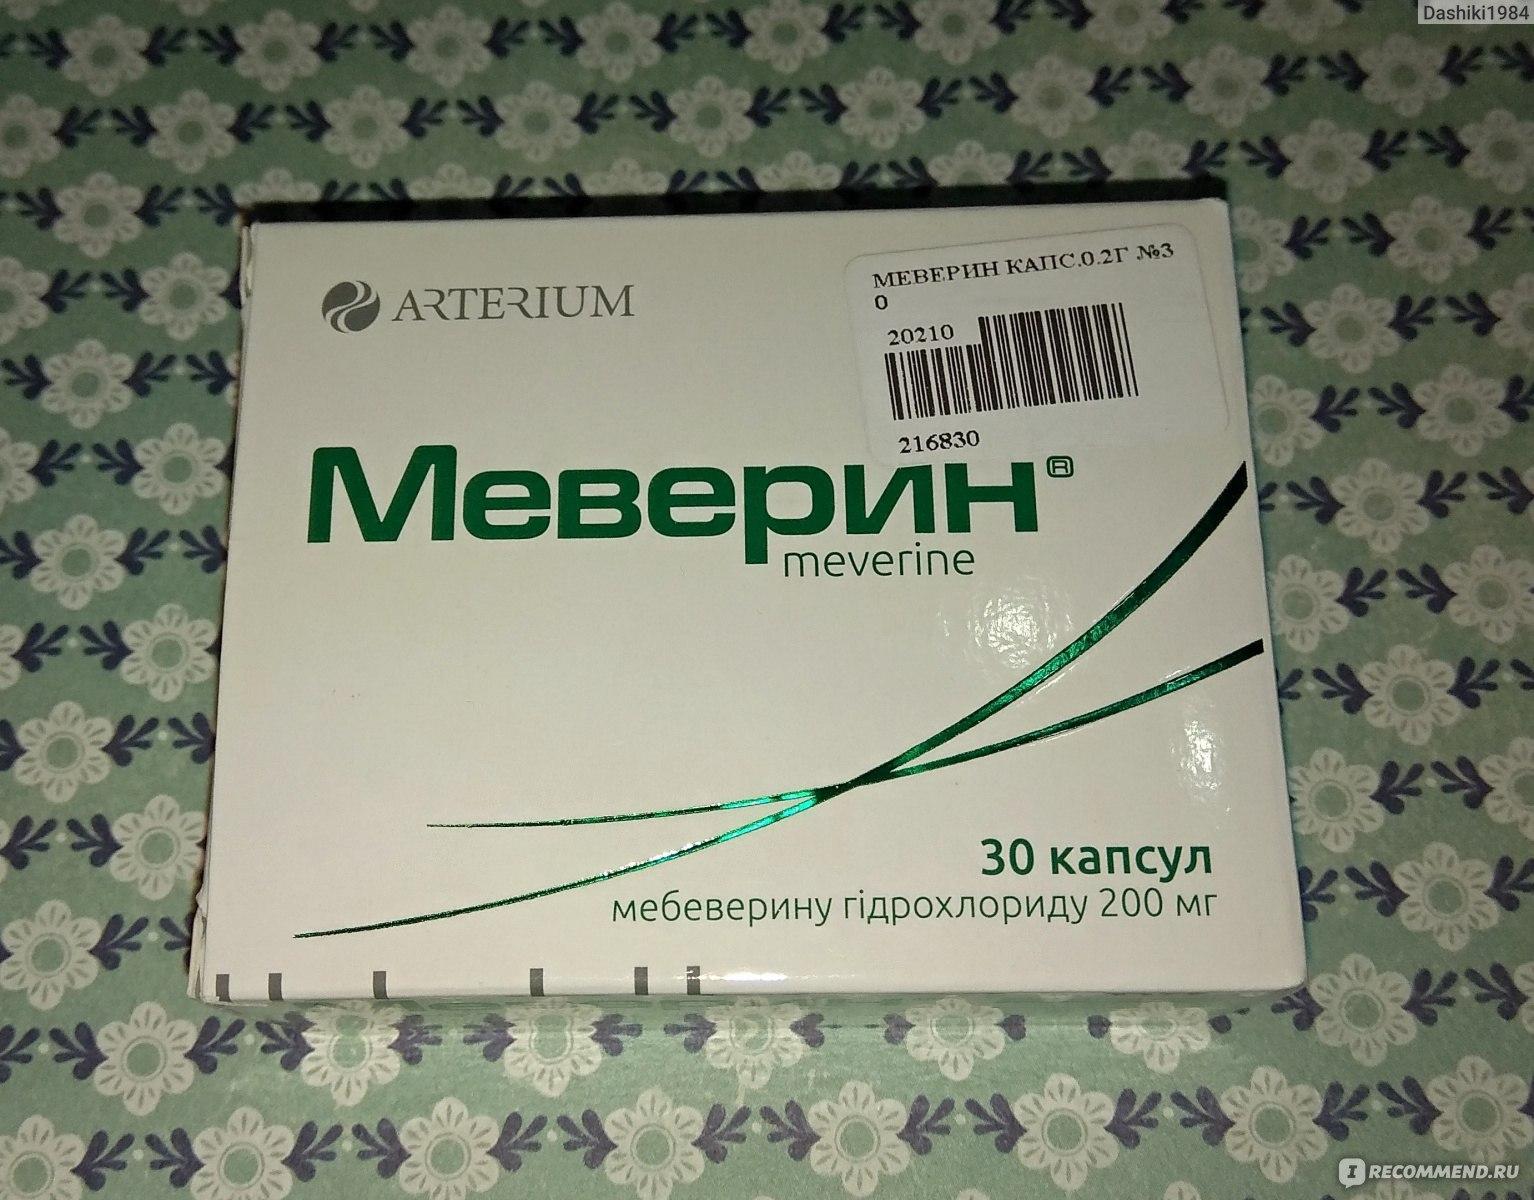 Меверин | meverine